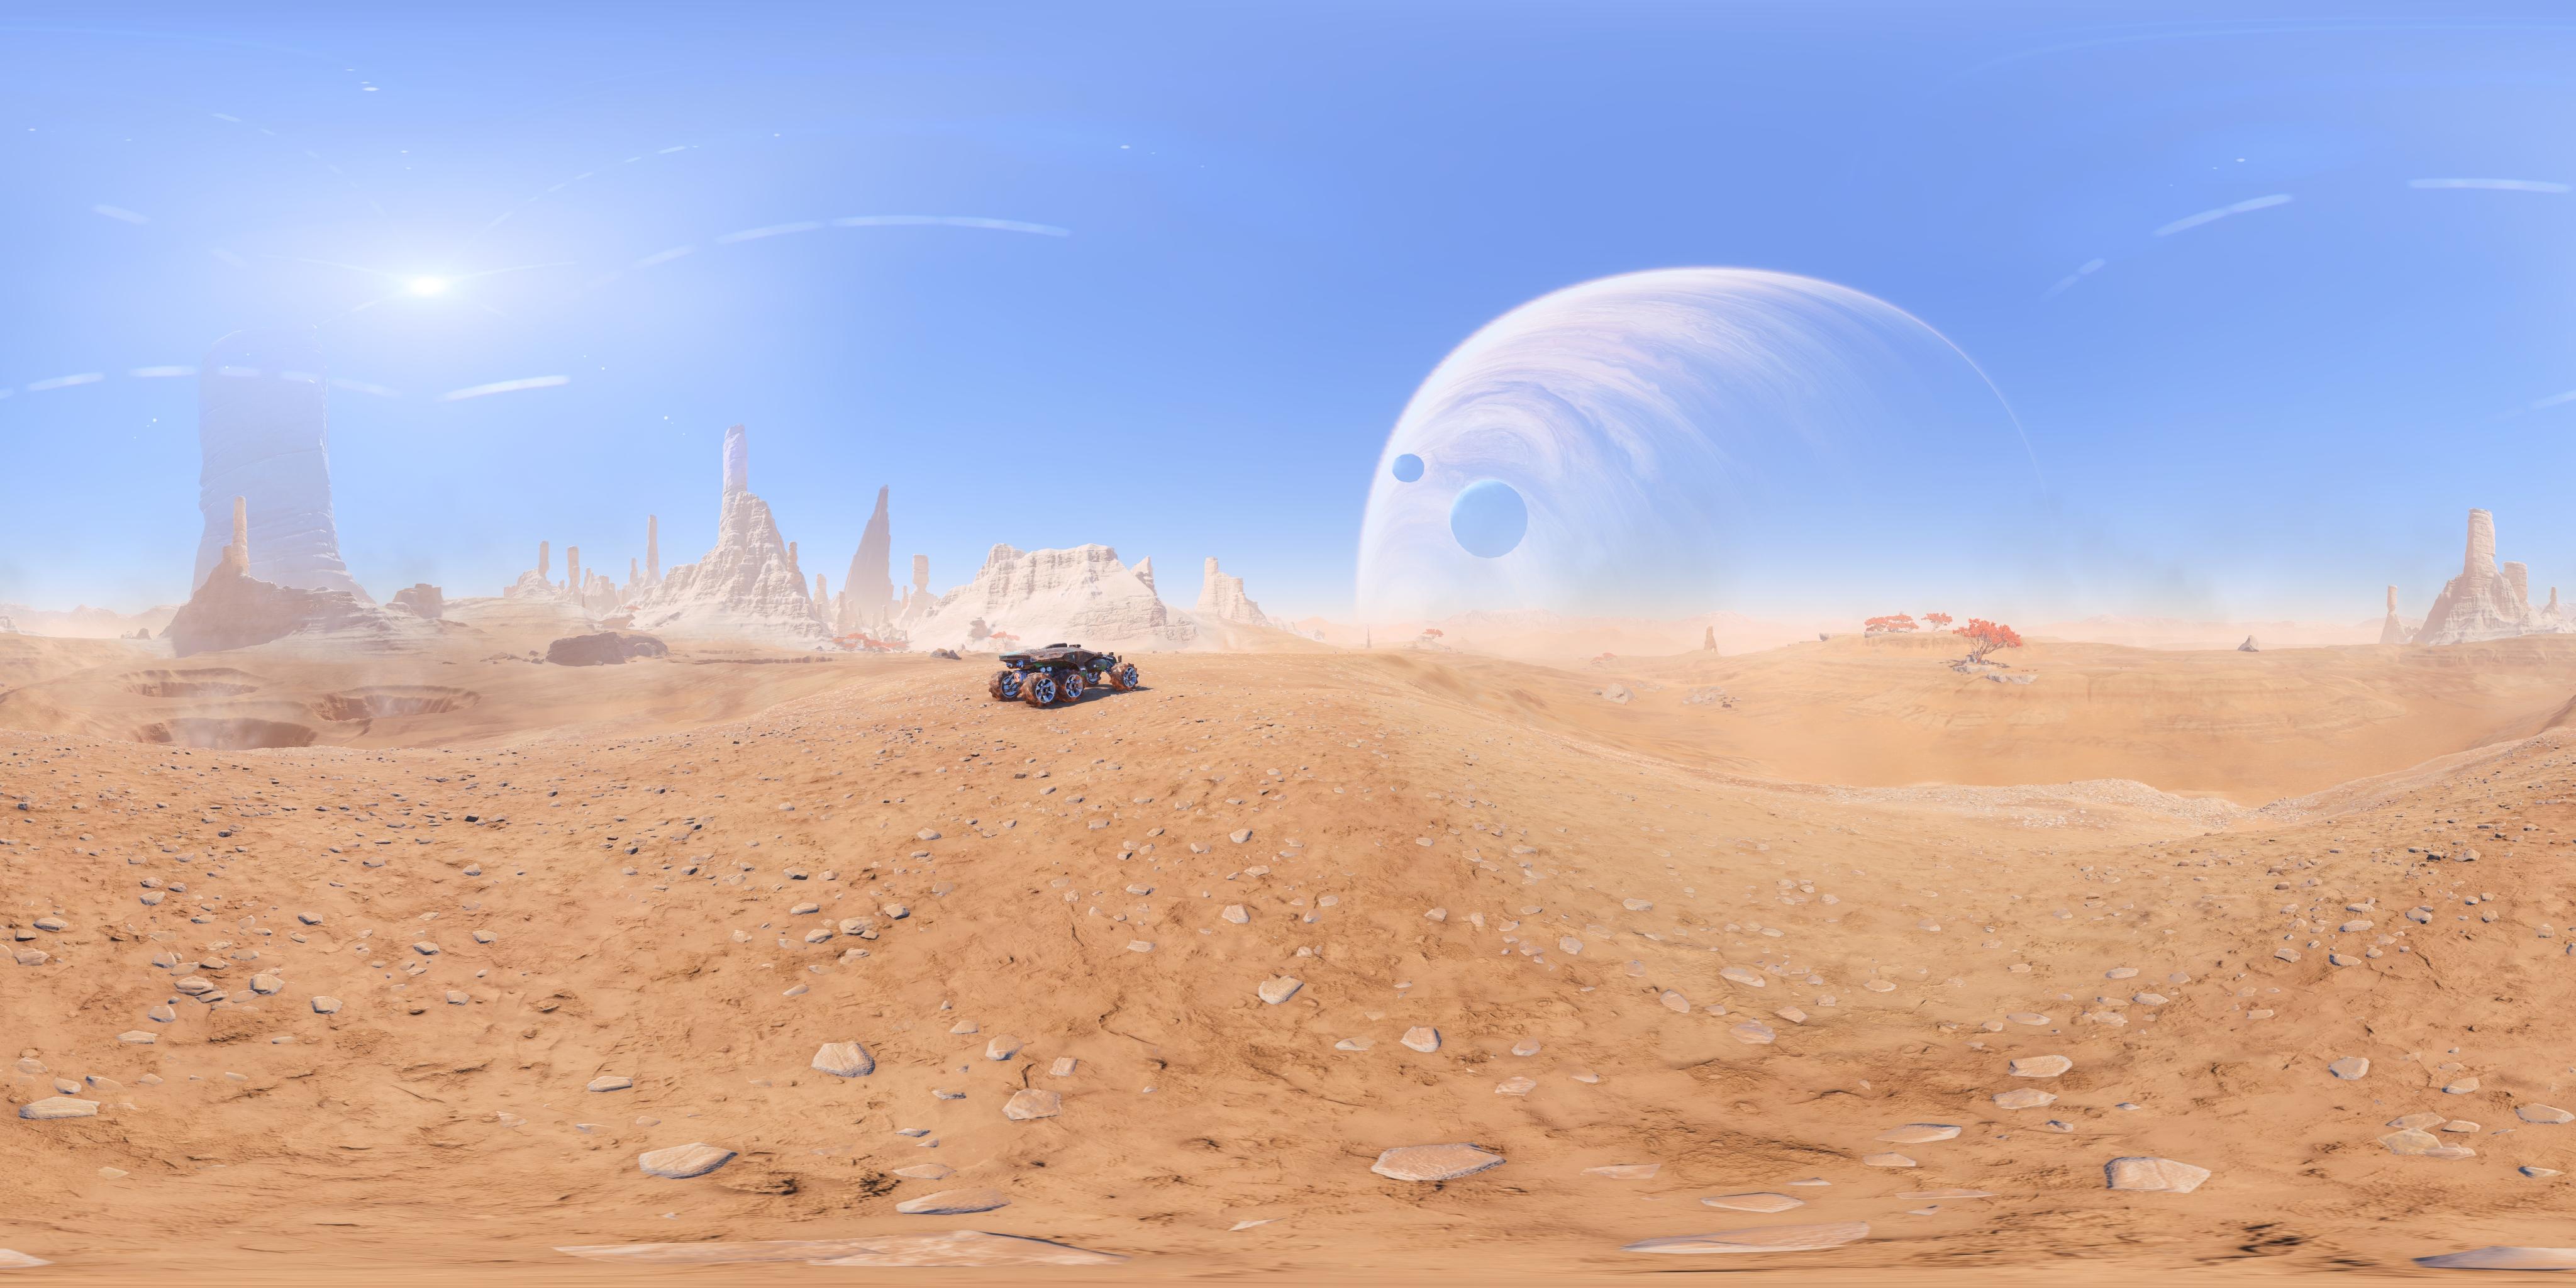 панорама - Mass Effect: Andromeda Кочевник ND1